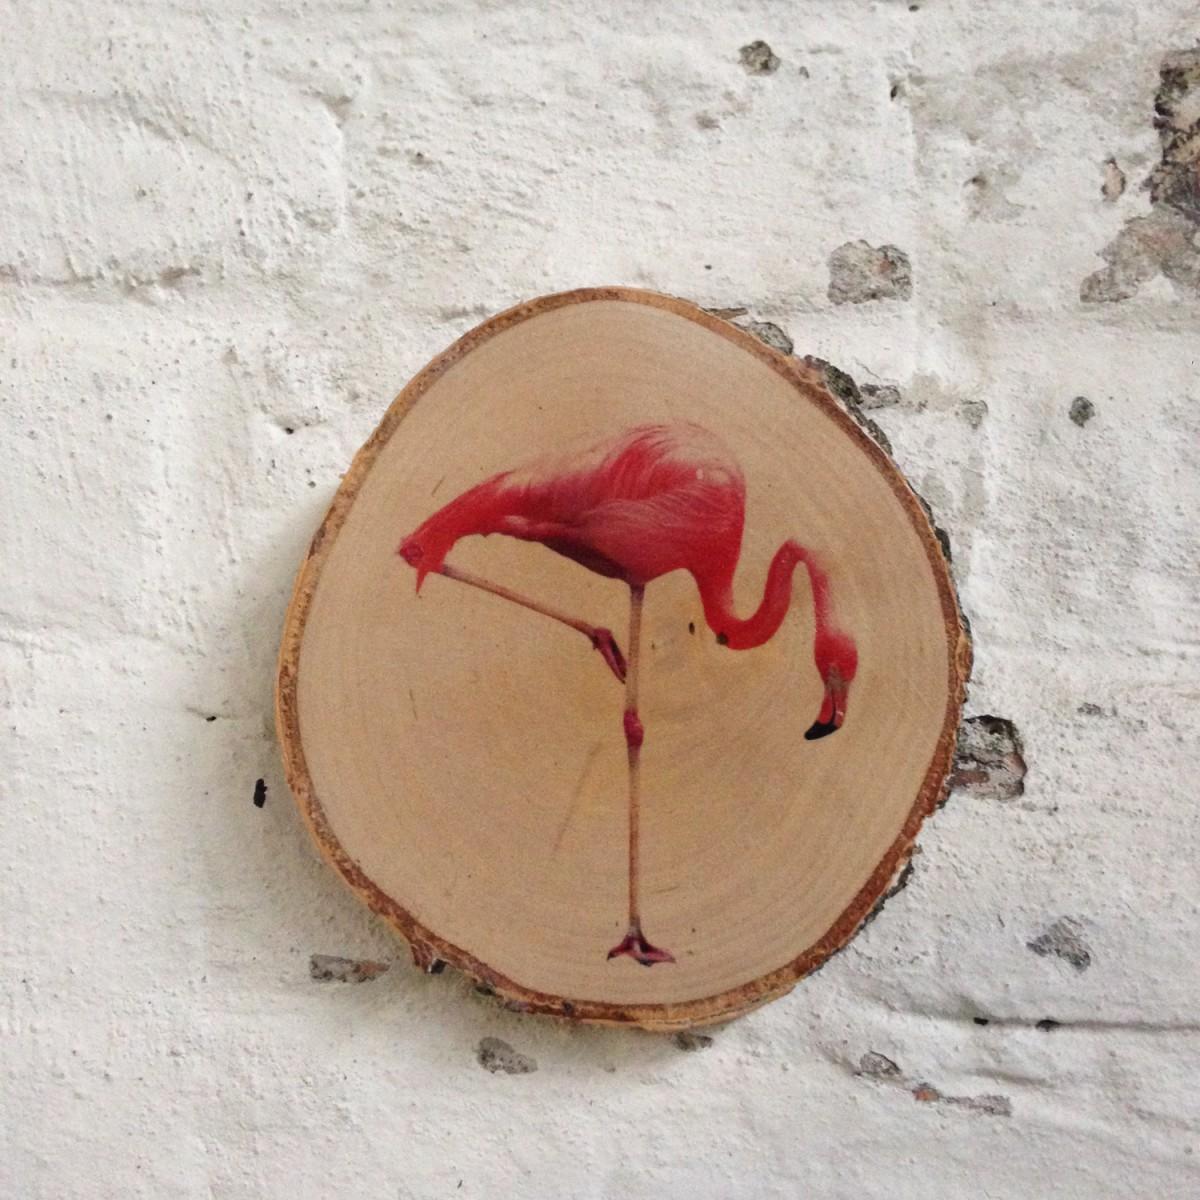 madeva holzliebe flamingo birkenastscheibe. Black Bedroom Furniture Sets. Home Design Ideas